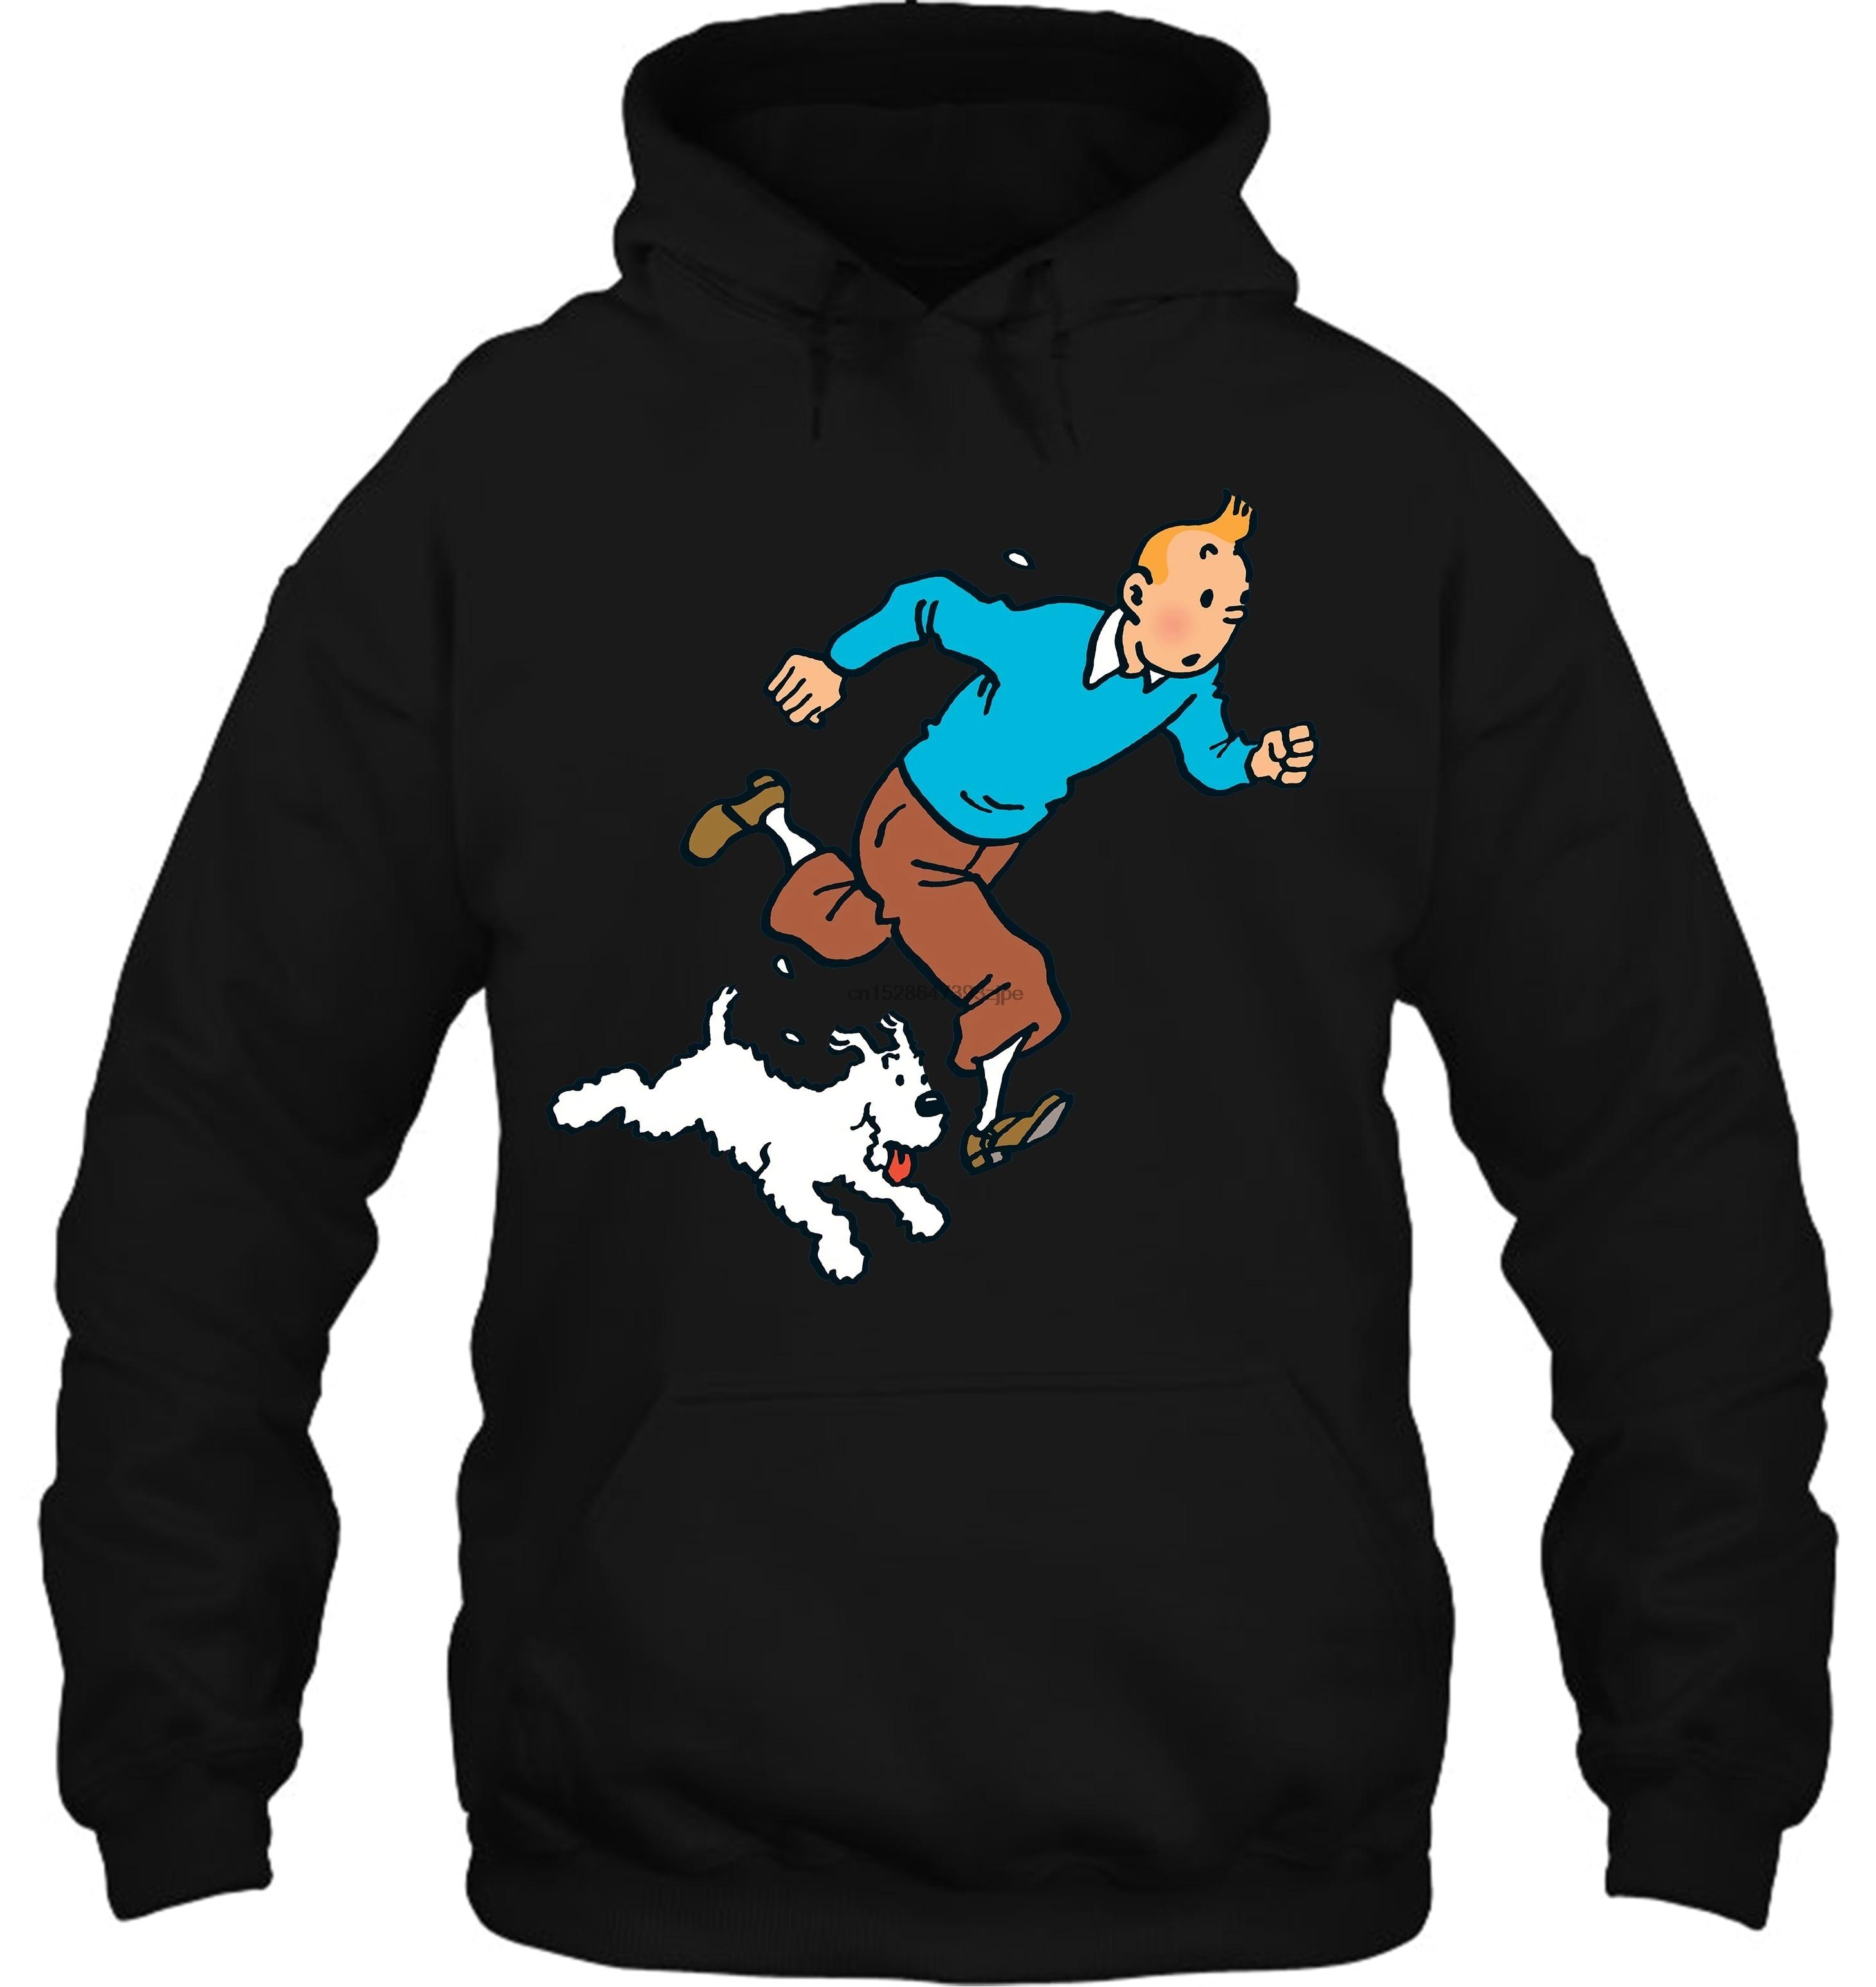 Tin Tin Adventure Tintin Dog Snowy Cartoon Tee Fan Gift New From US Streetwear Men Women Hoodies Sweatshirts